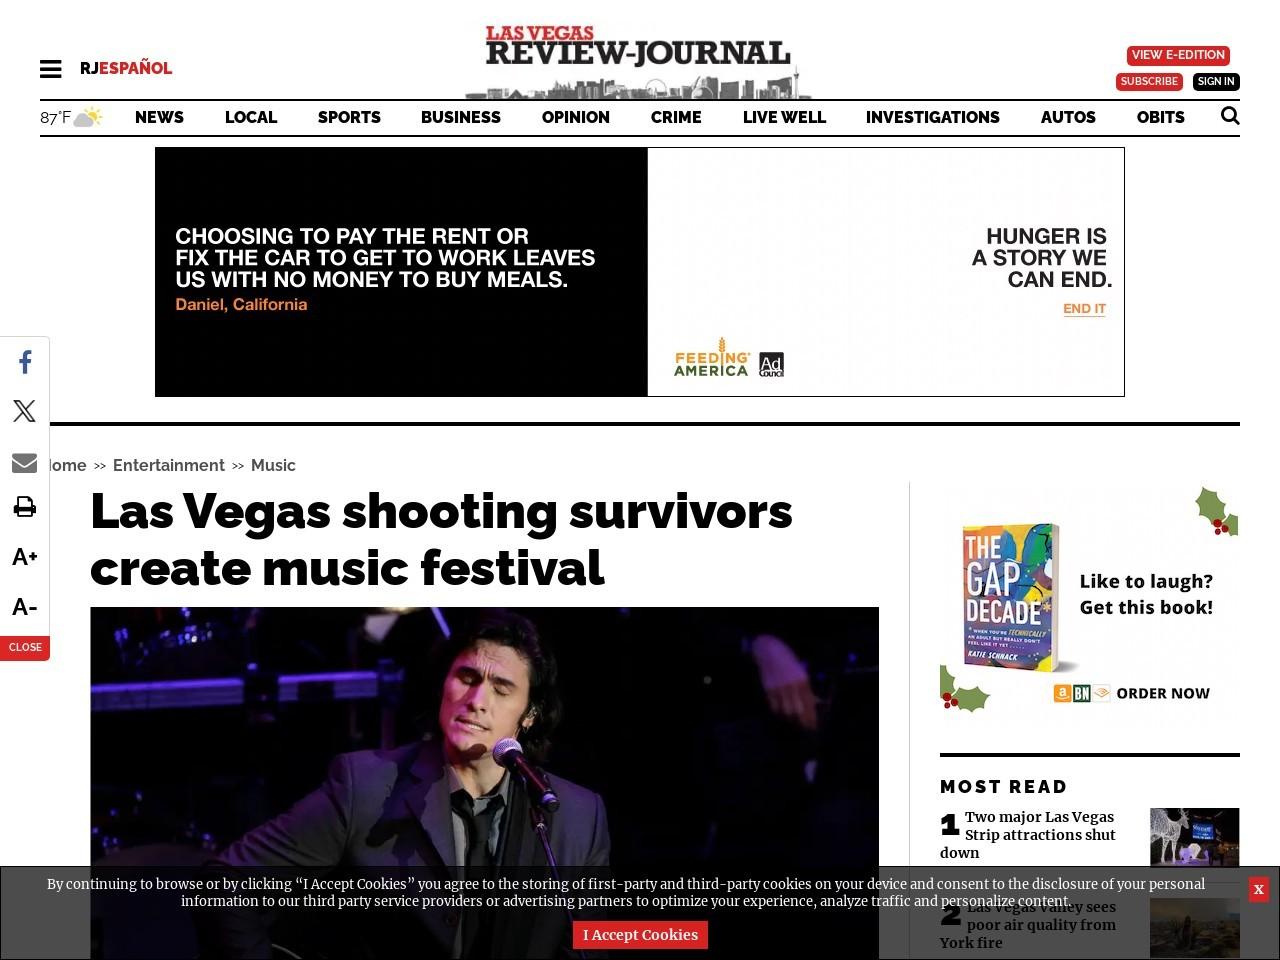 Las Vegas shooting survivors create music festival